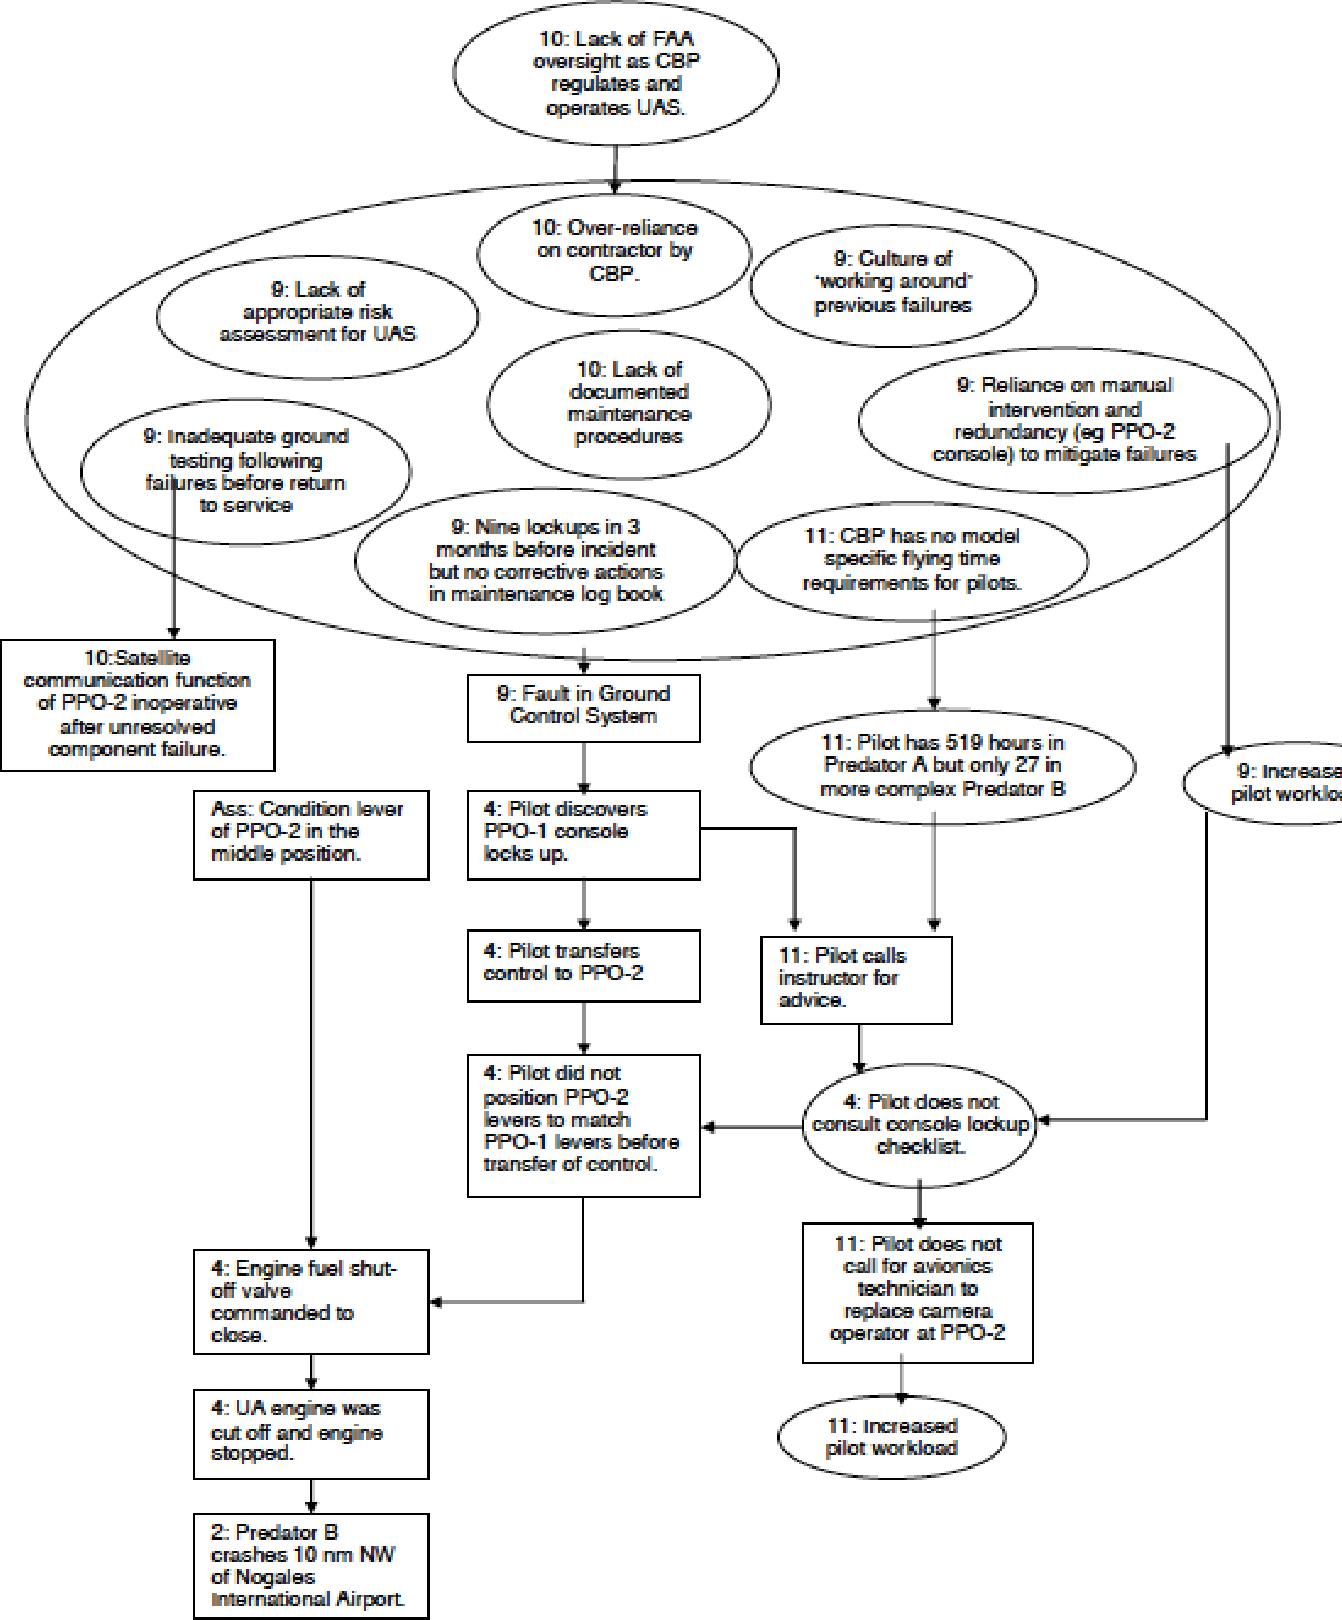 Accident analysis and hazard analysis for human and organizational factors semantic scholar